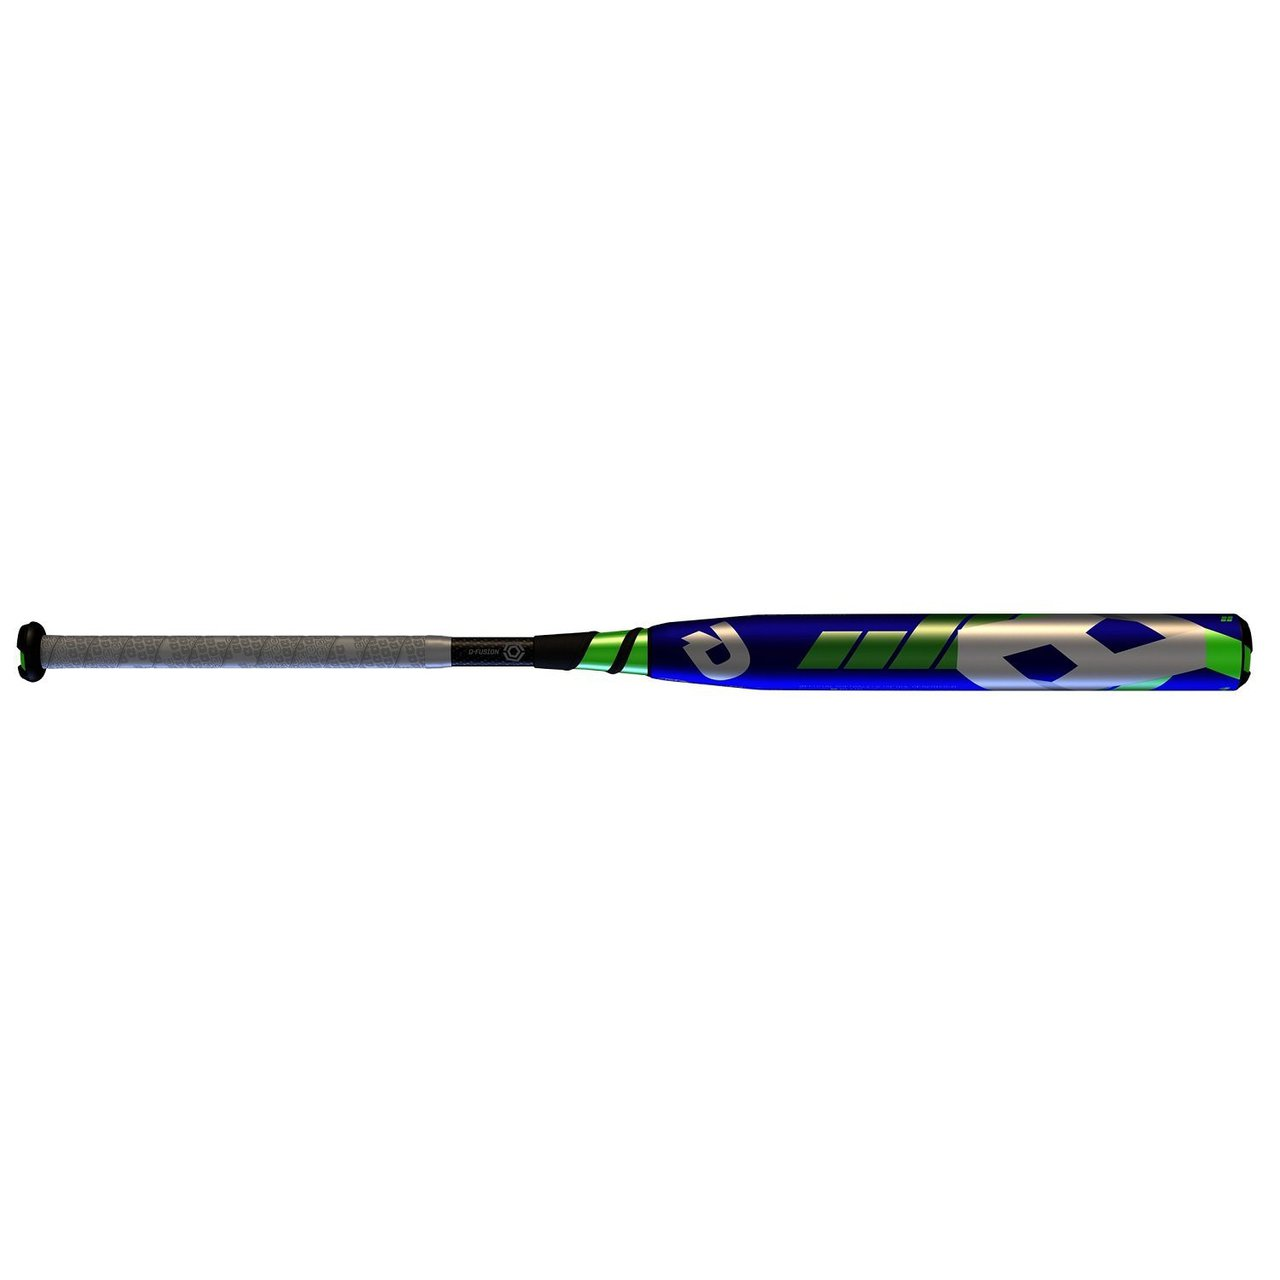 demarini-2016-cf8-insane-fastpitch-softball-bat-10-32-inch DXCFI2232-16 DeMarini 887768301804 DeMarini CF8 is set to impress Developed for a power hitter